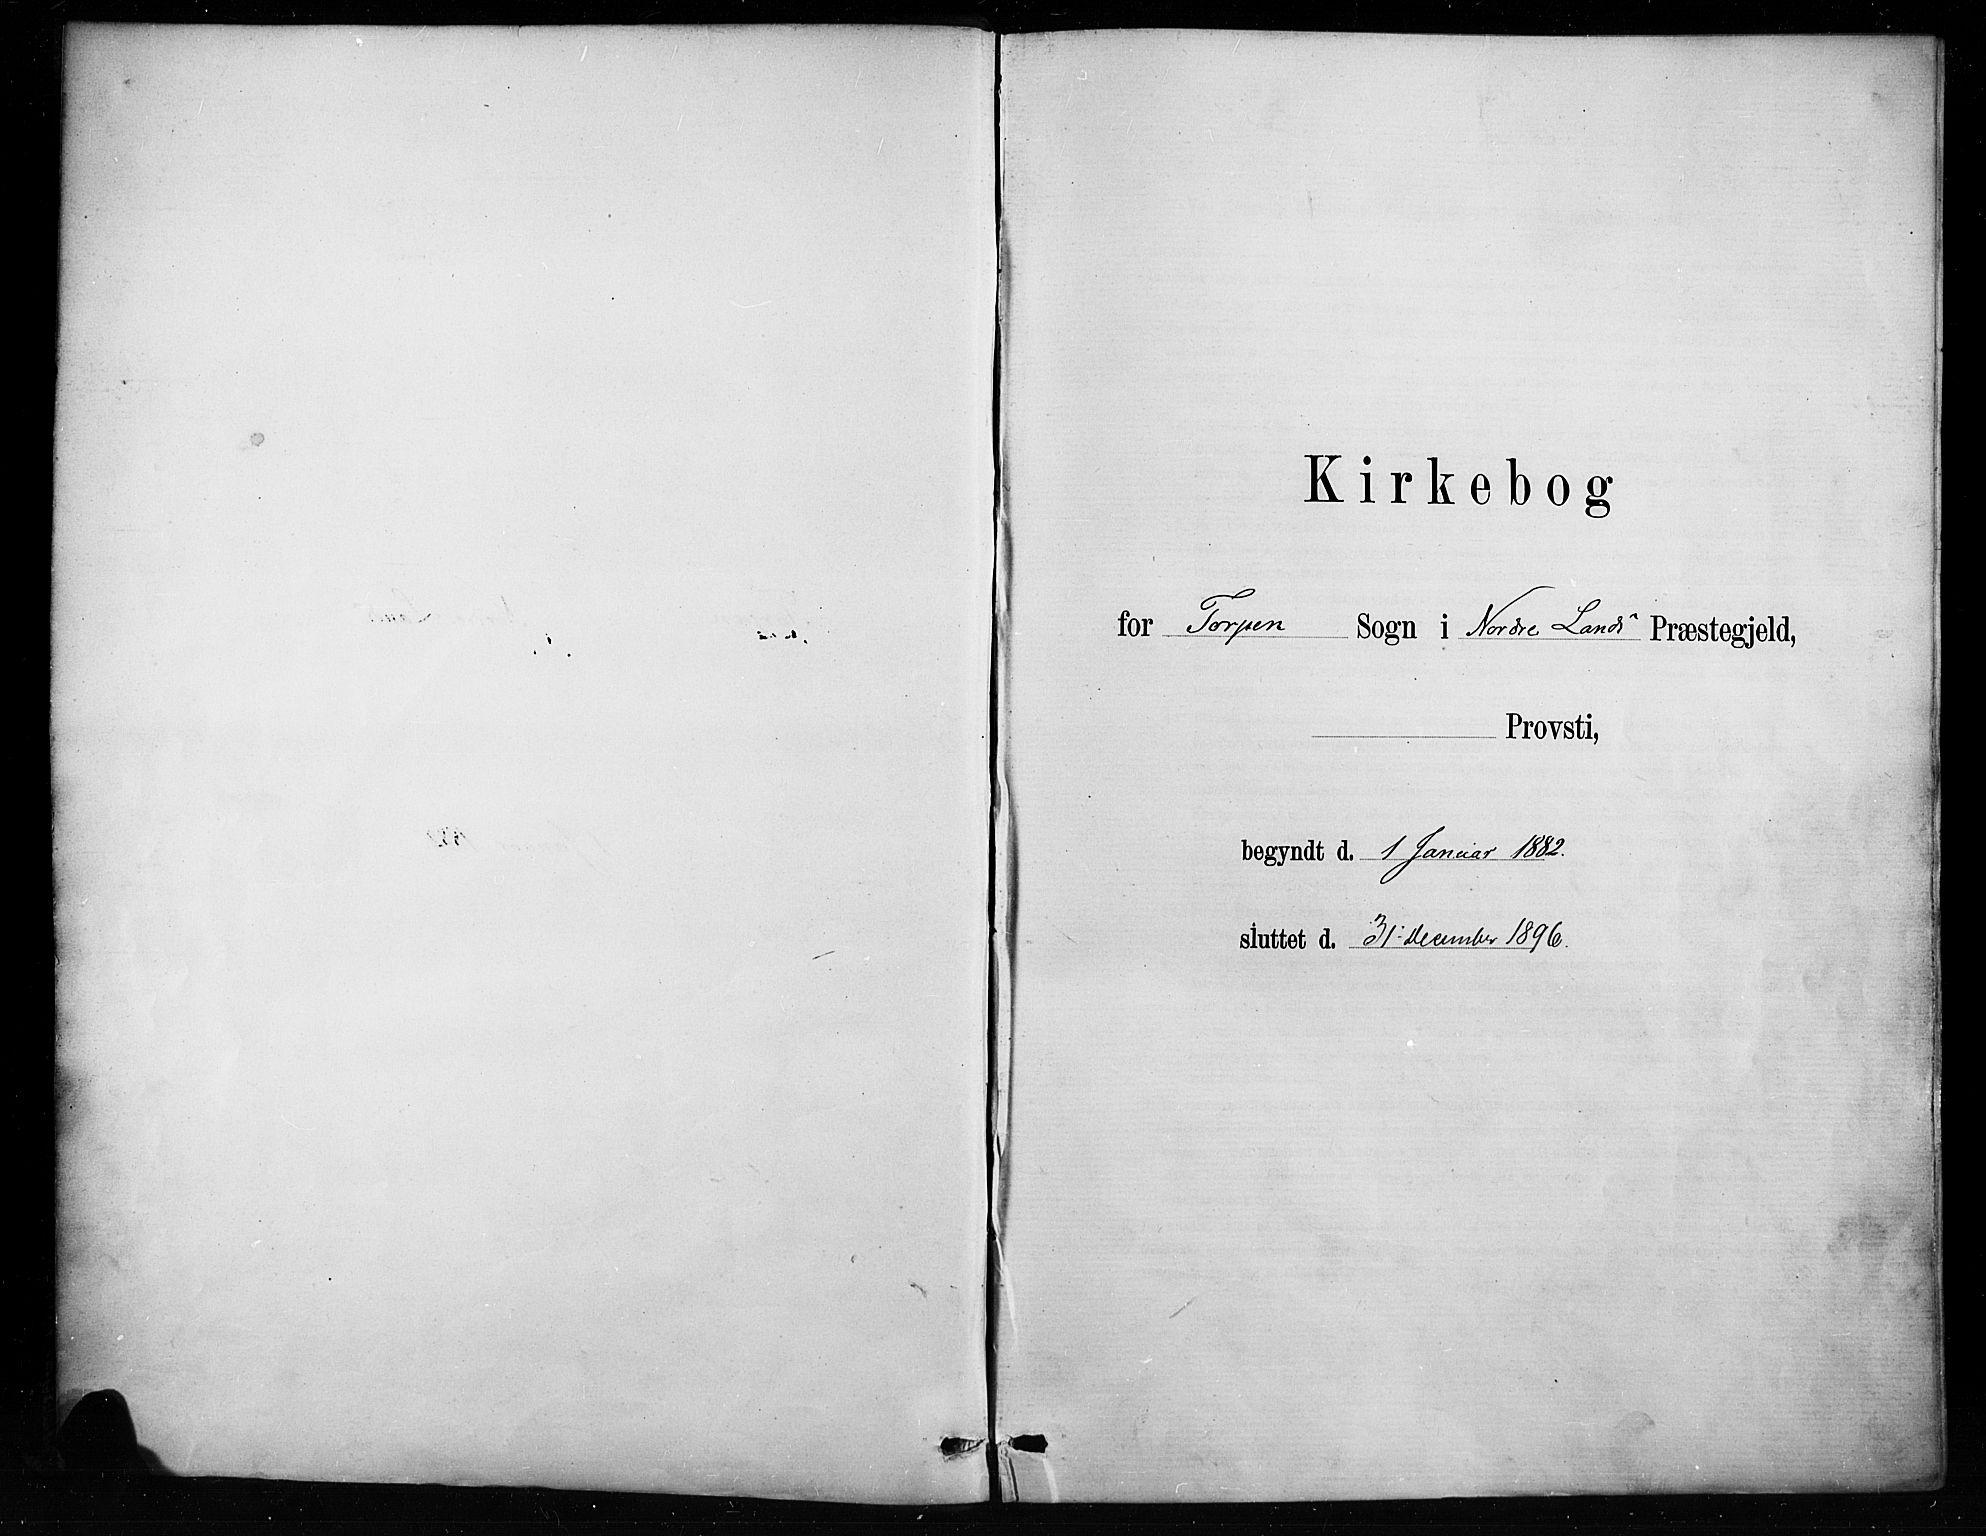 SAH, Nordre Land prestekontor, Ministerialbok nr. 4, 1882-1896